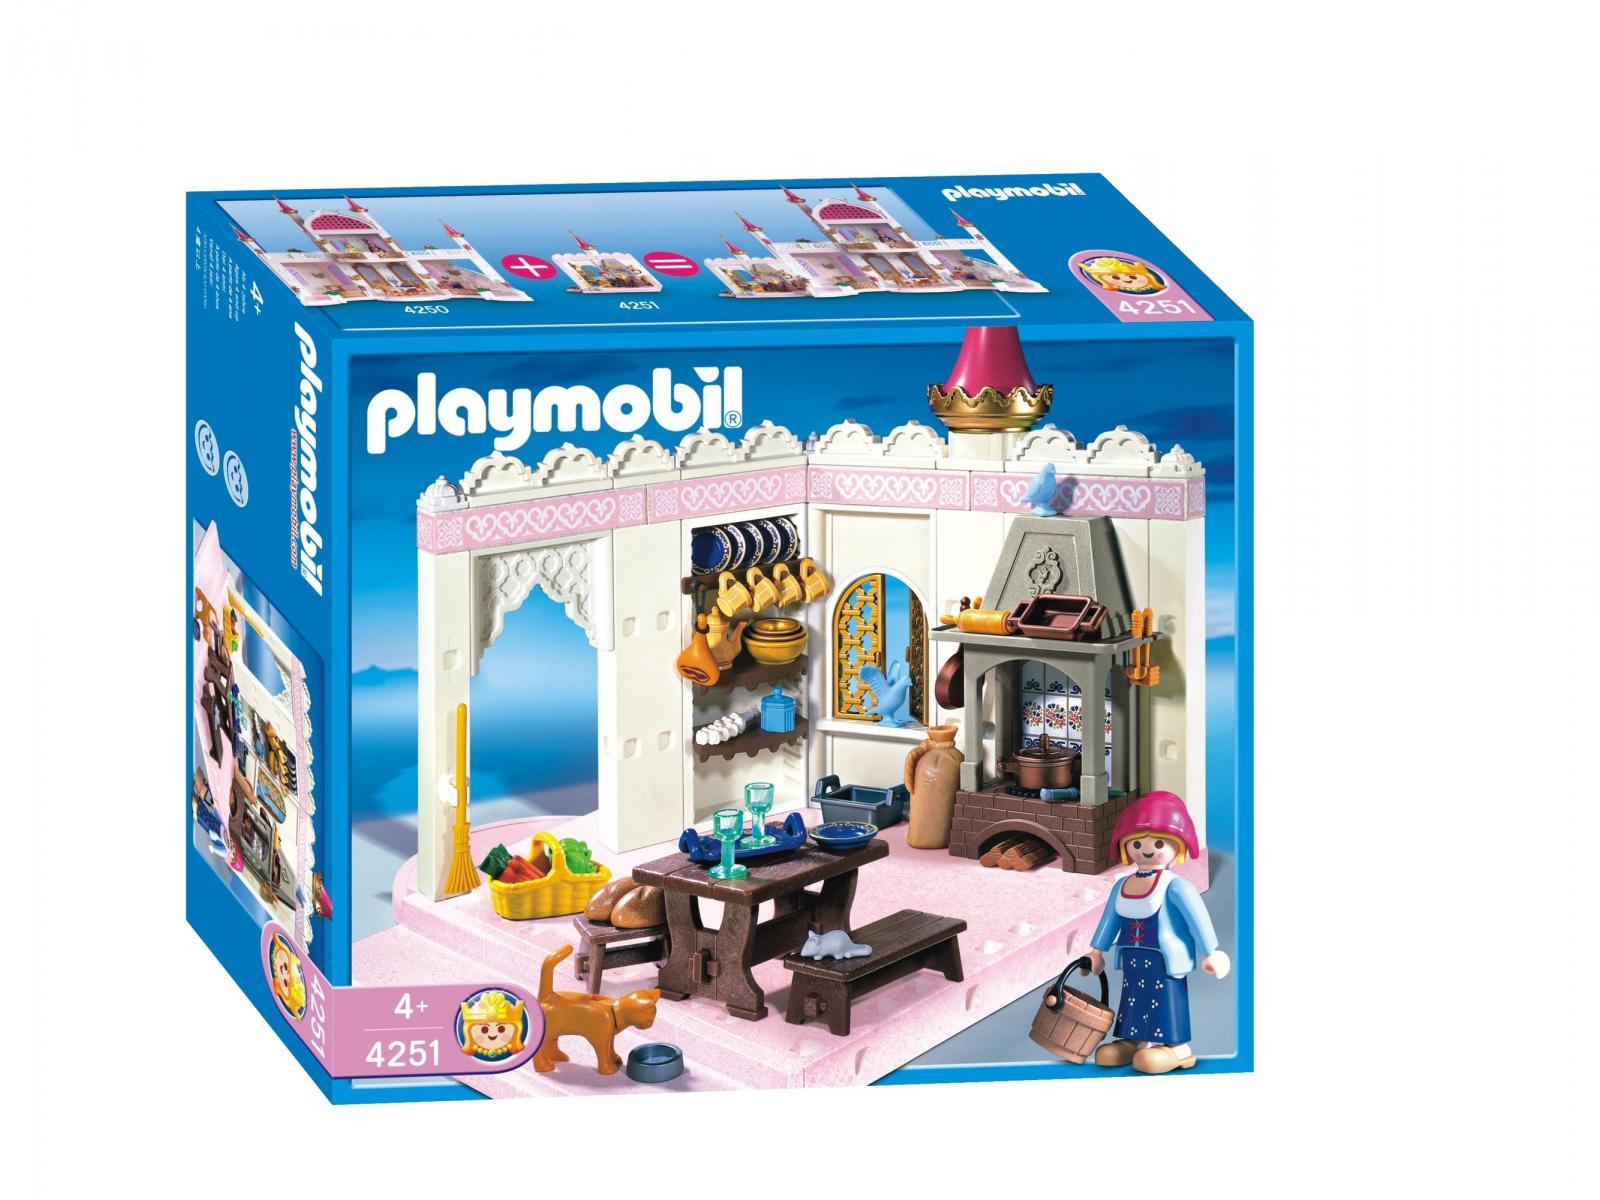 playmobil cuisini re et cuisine de princesse. Black Bedroom Furniture Sets. Home Design Ideas